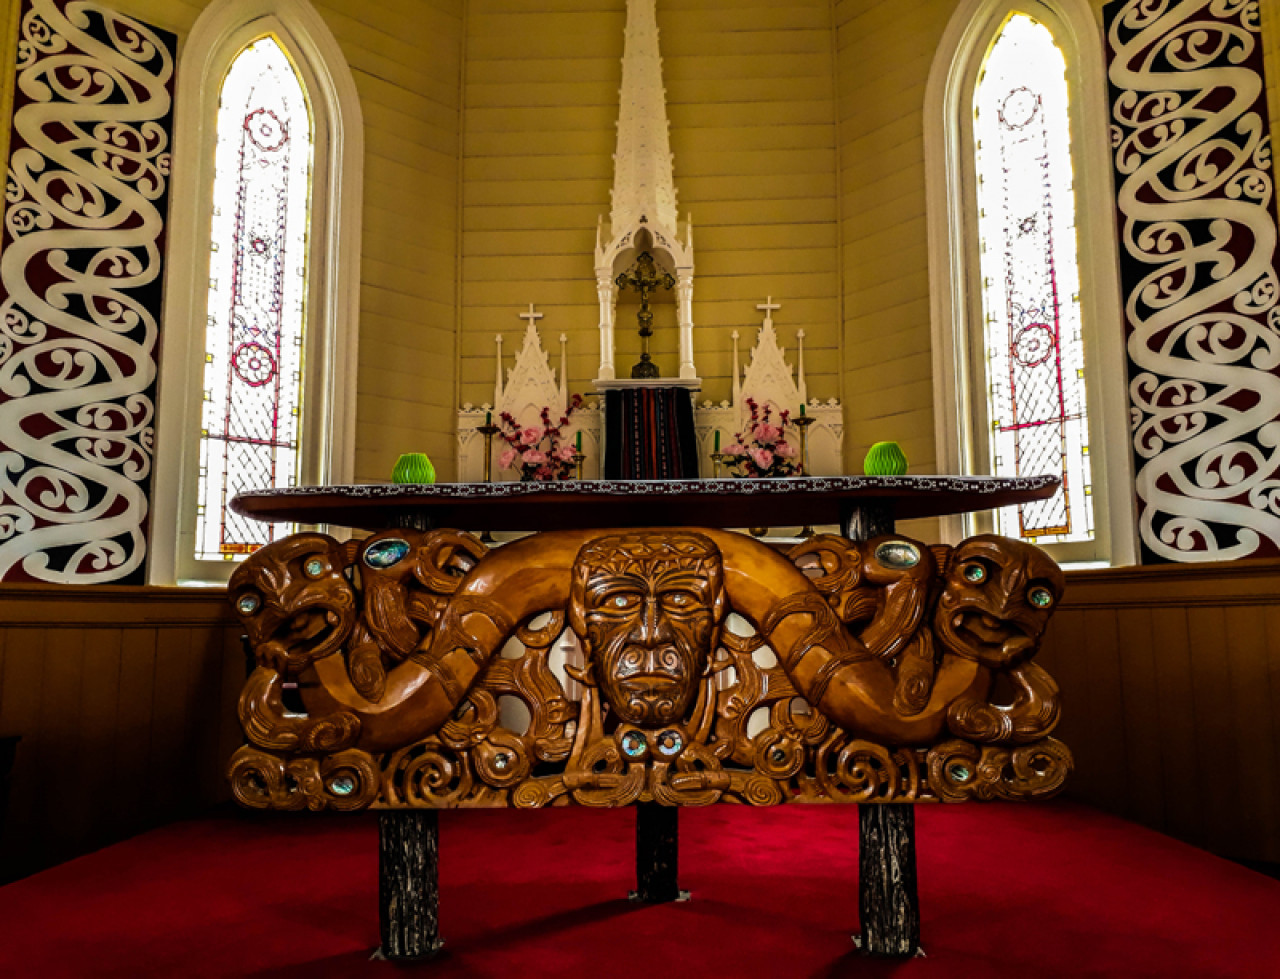 The altar inside St. Joseph's church.